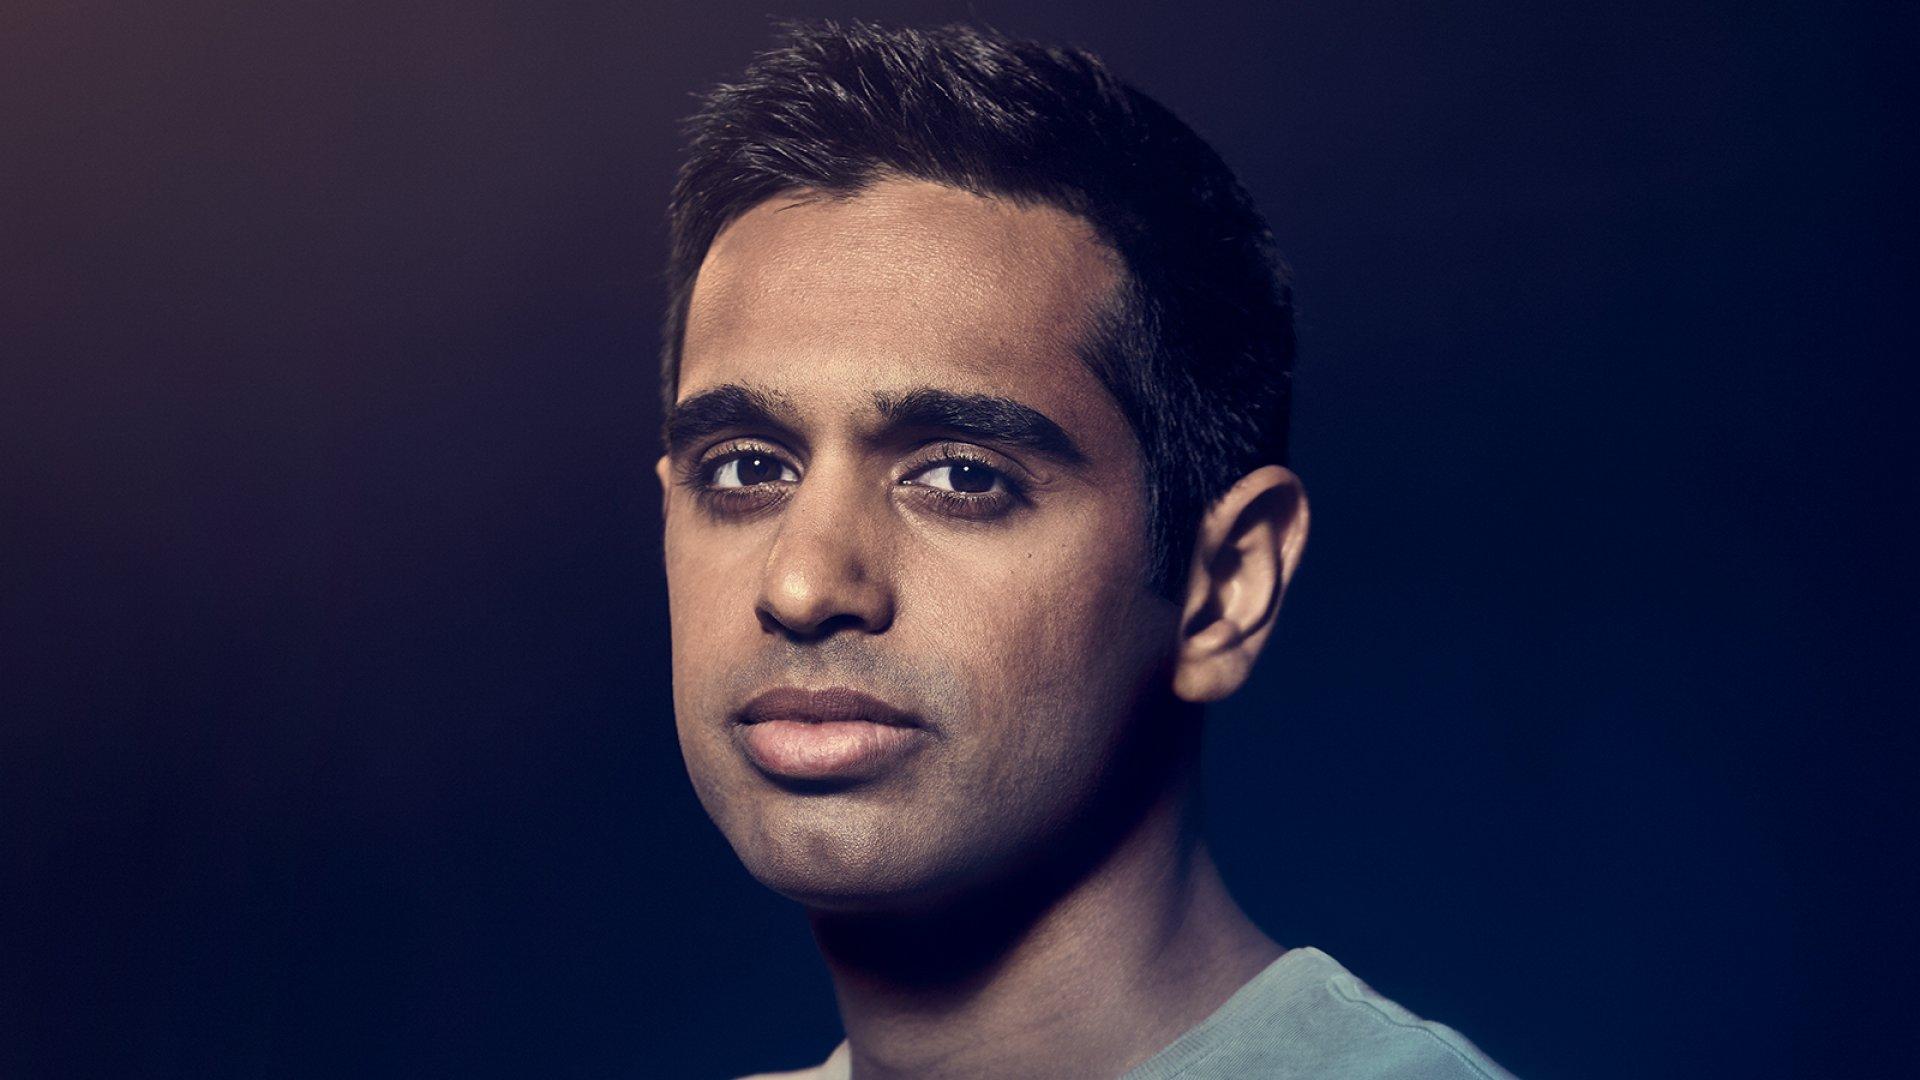 Mixpanel founder Suhail Doshi.